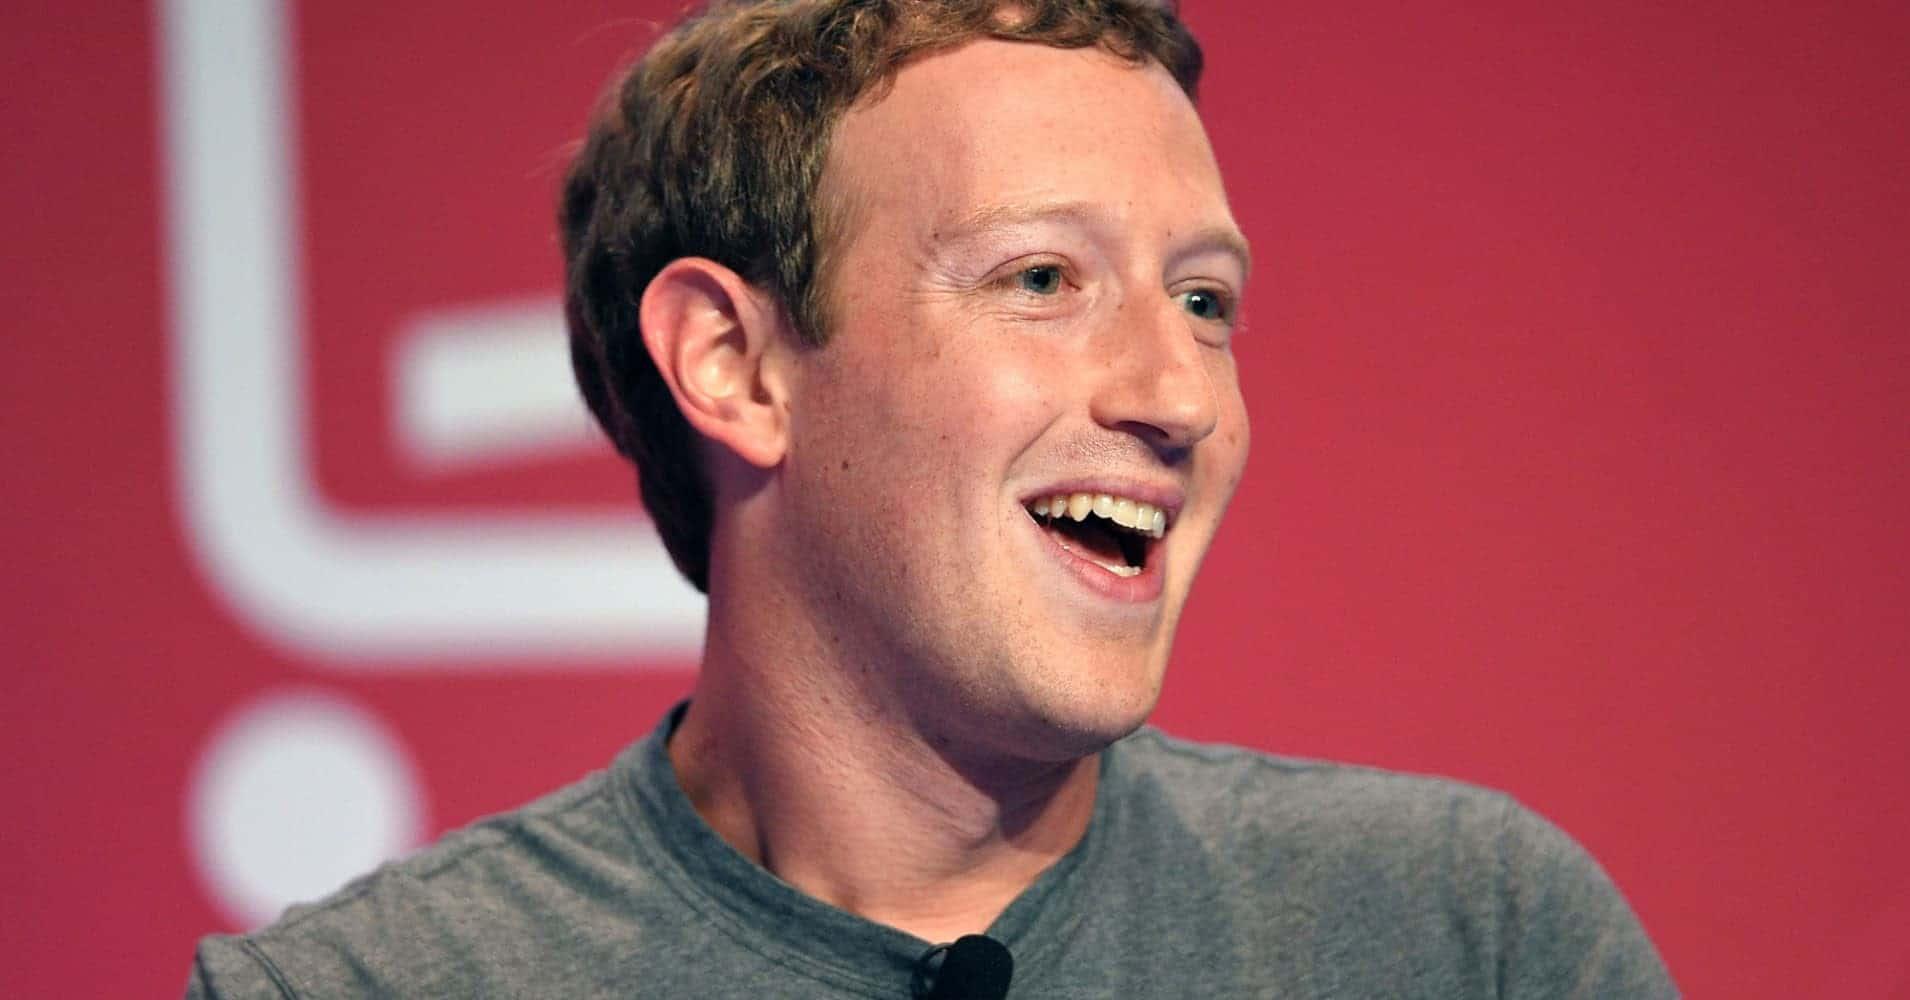 مارک زاکربرگ مالک شرکت فیسبوک و مالک شبکه اجتماعی اینستاگرام - چیکاو